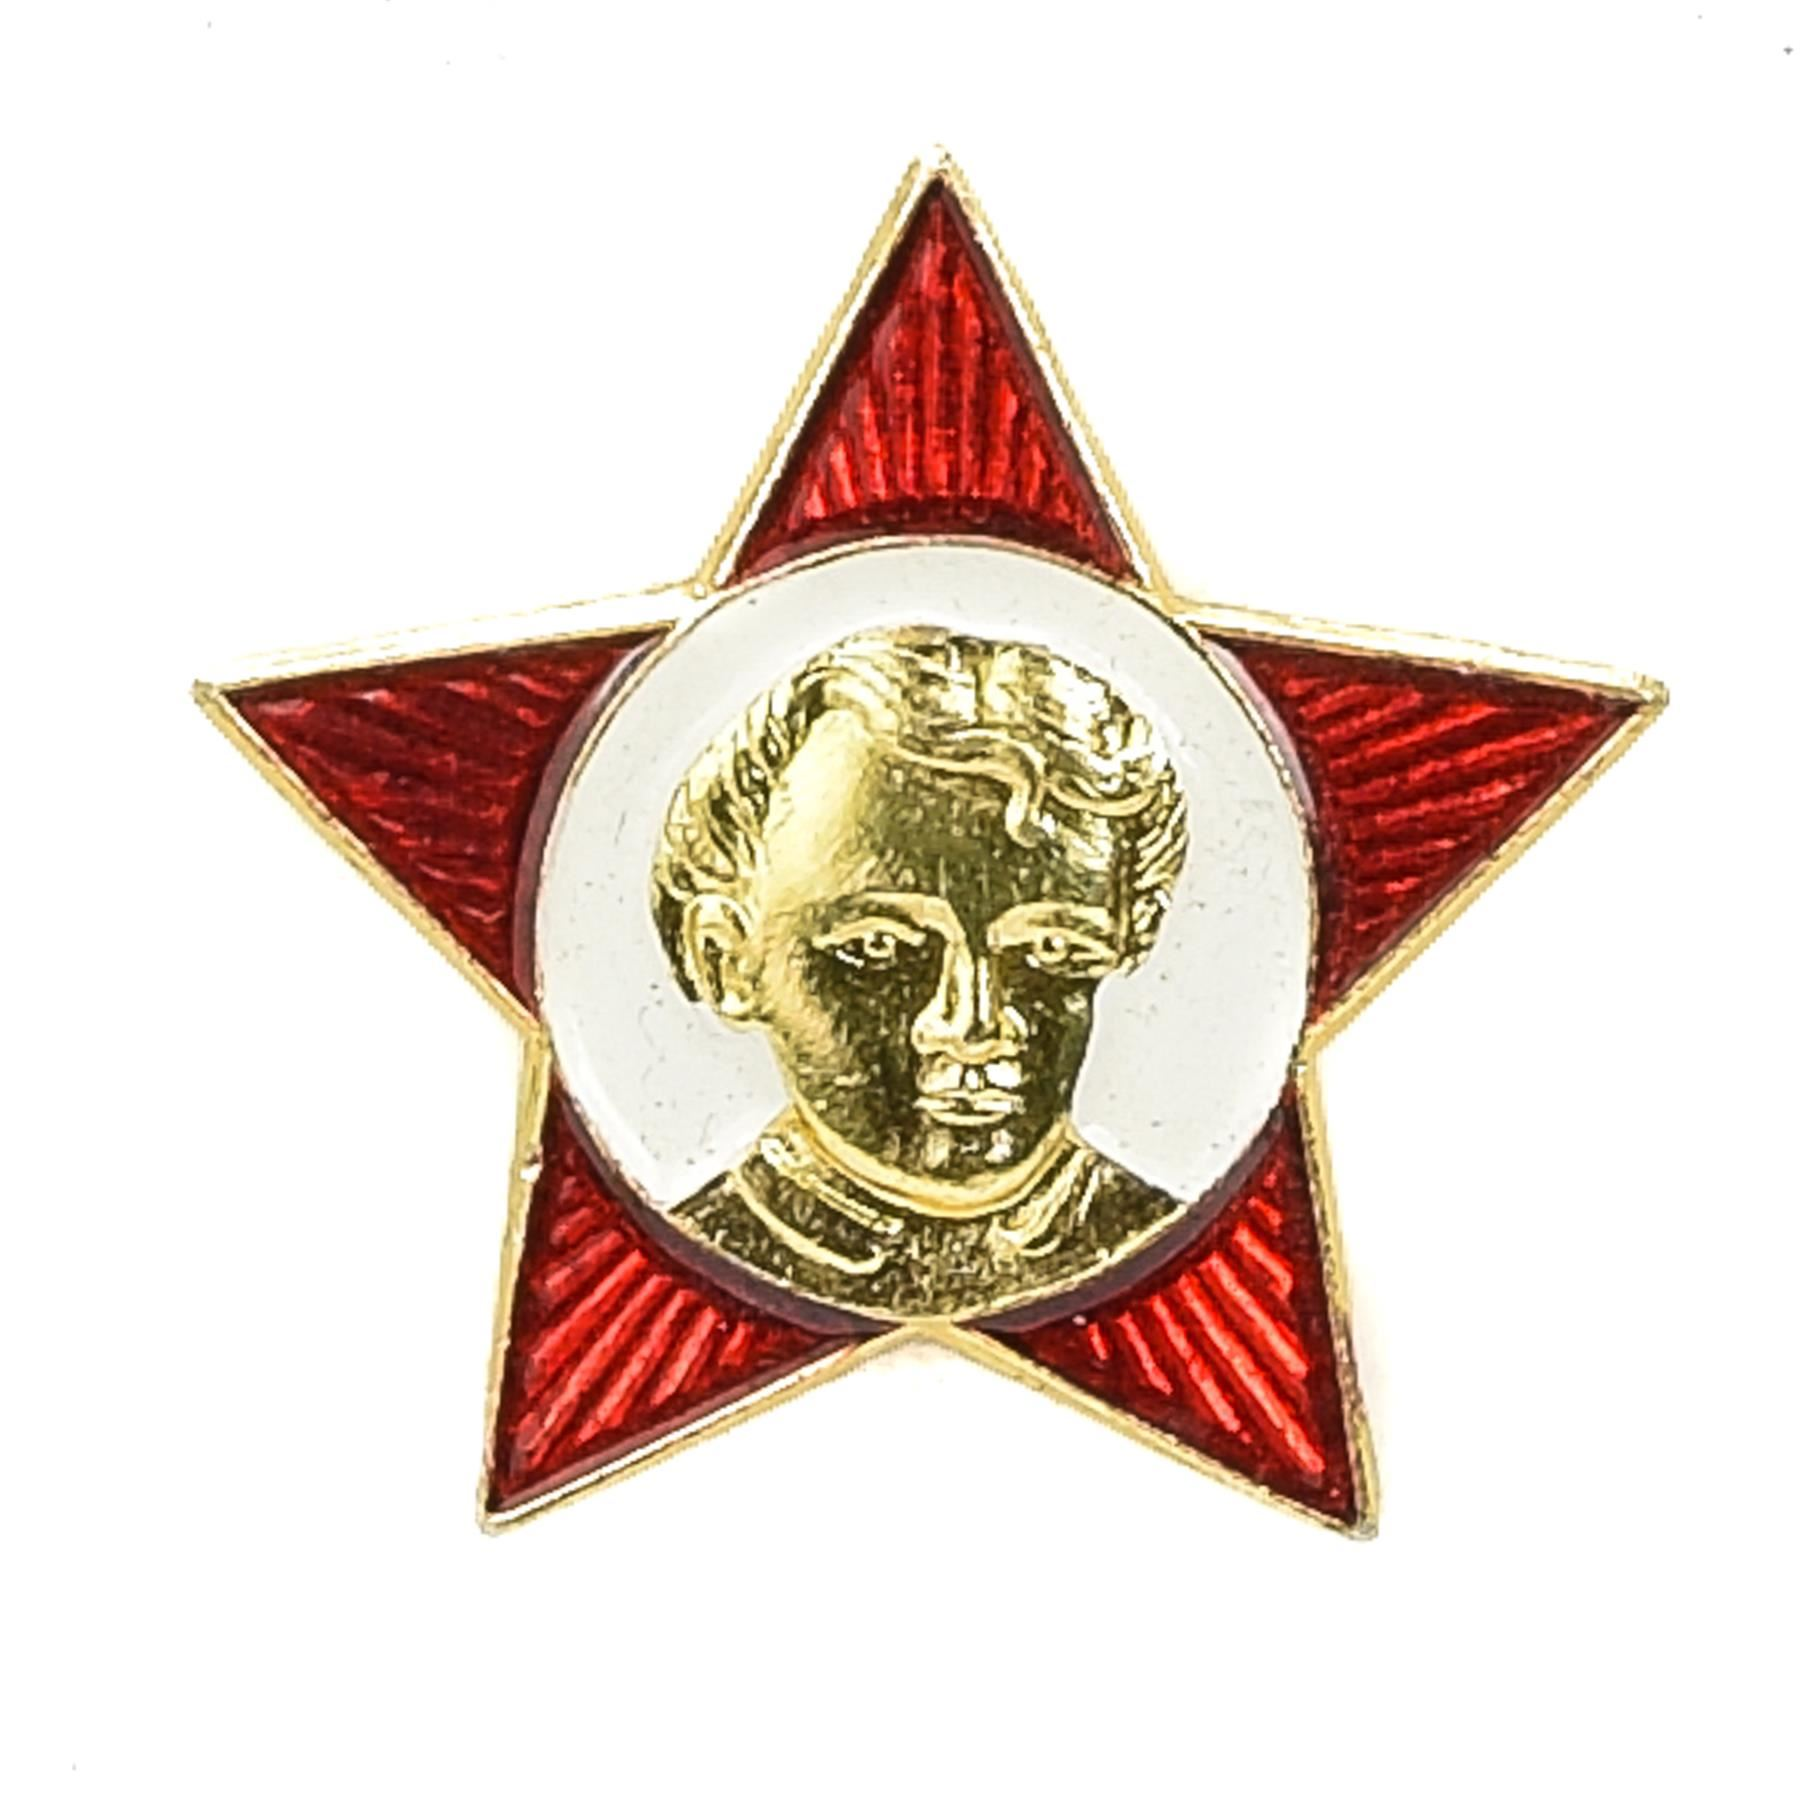 Communism Vladimir Lenin enamel pin Young Pioneer badge propaganda USSR Vintage Soviet memorabilia 1970s